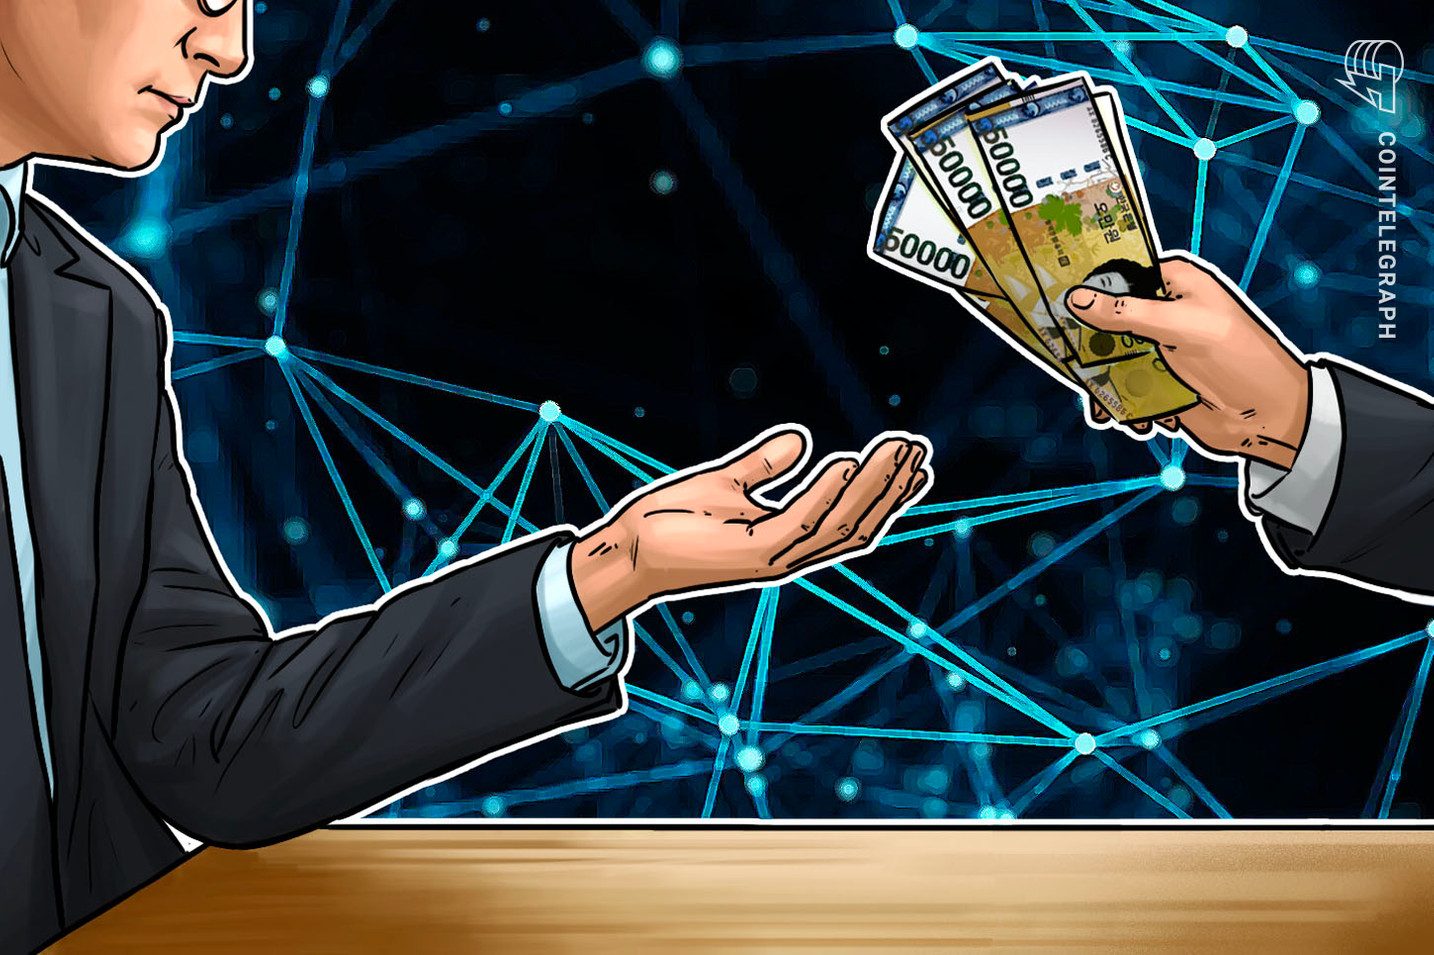 South Korean Blockchain Startup Raises $8M for Identity Authentication